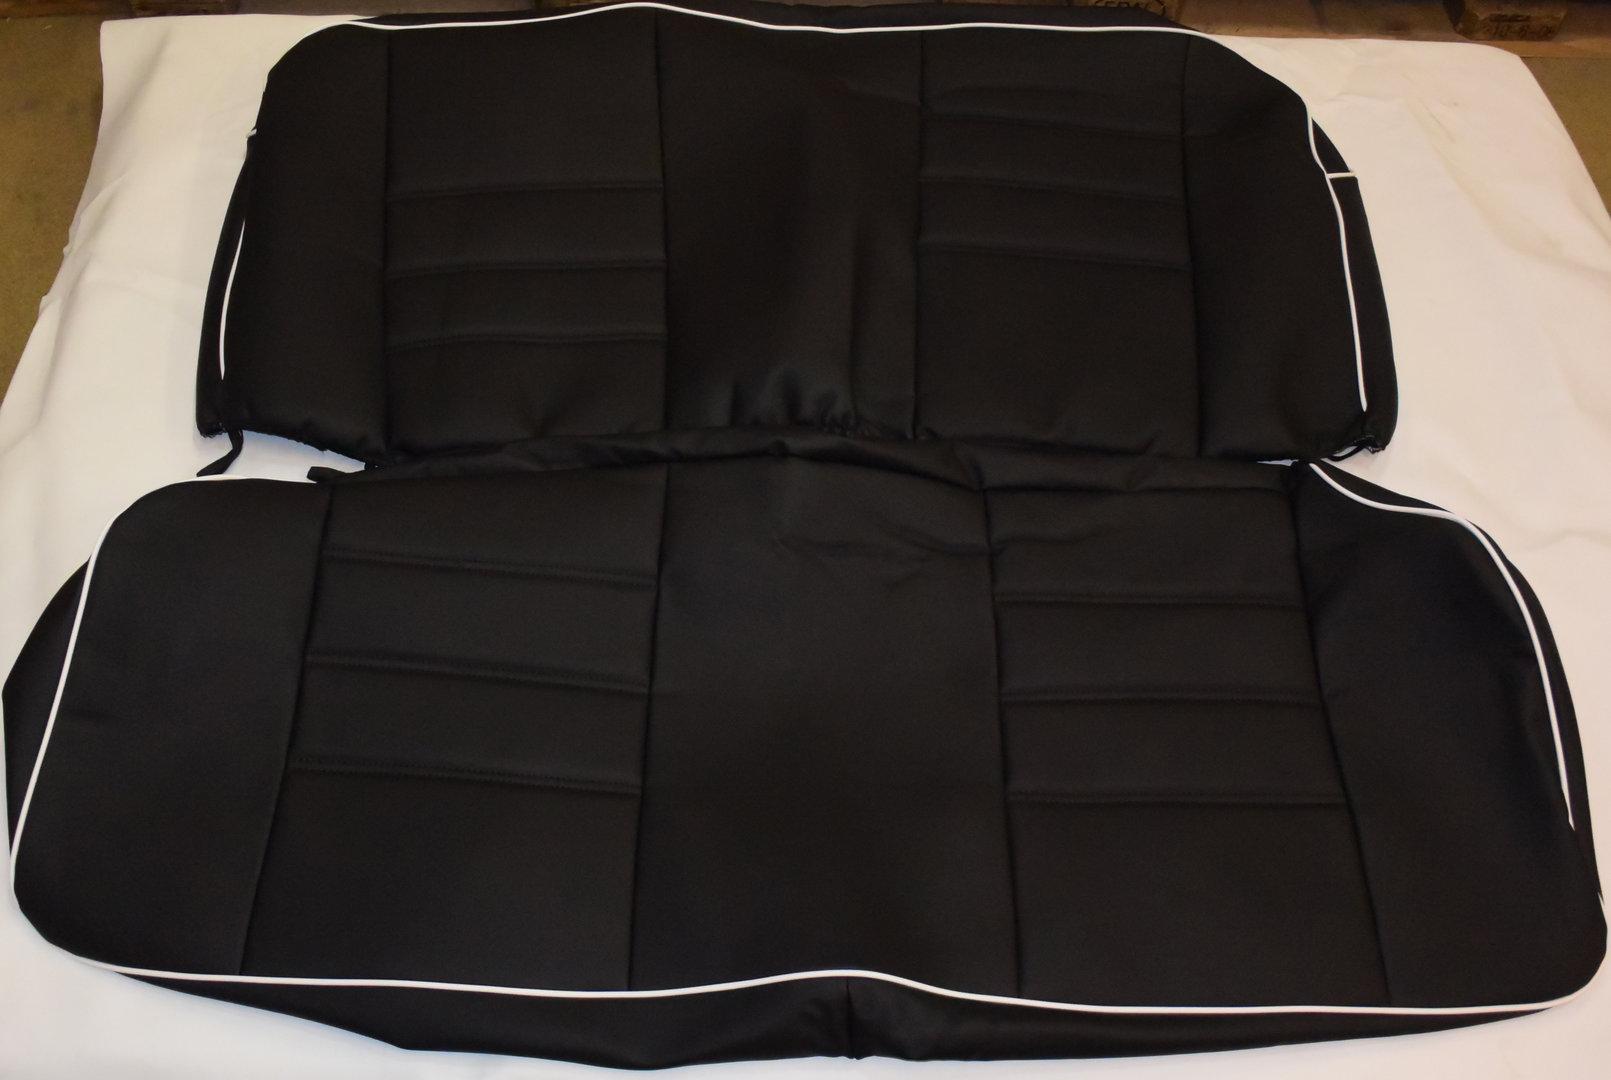 VW Käfer Limousine 08/55 - 07/57 Maß Sitzbezüge in schwarz